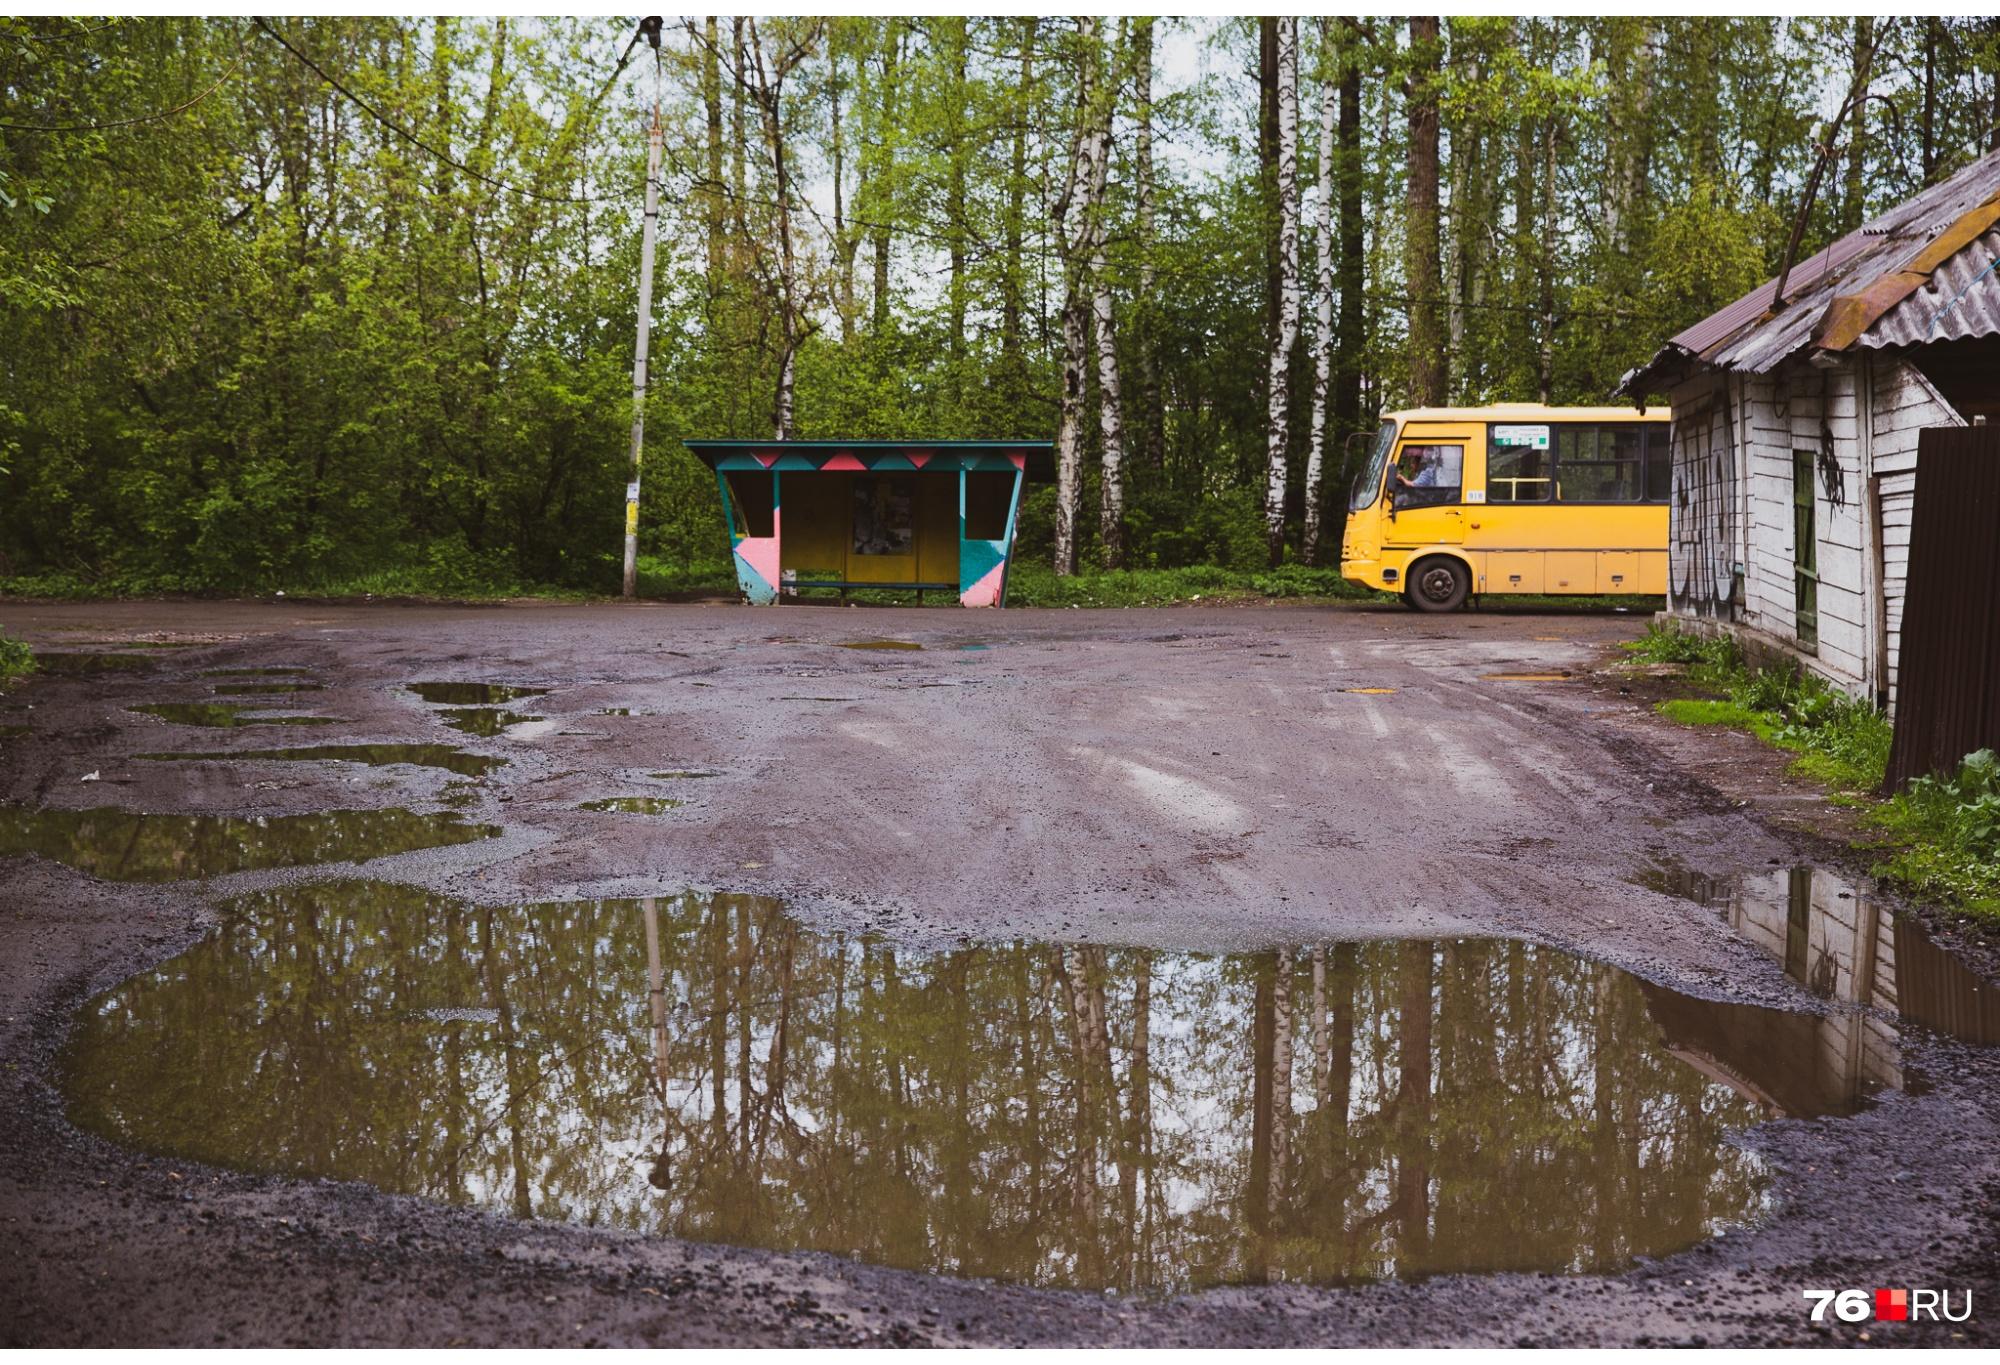 В Очапки ходят маршрутки и автобус